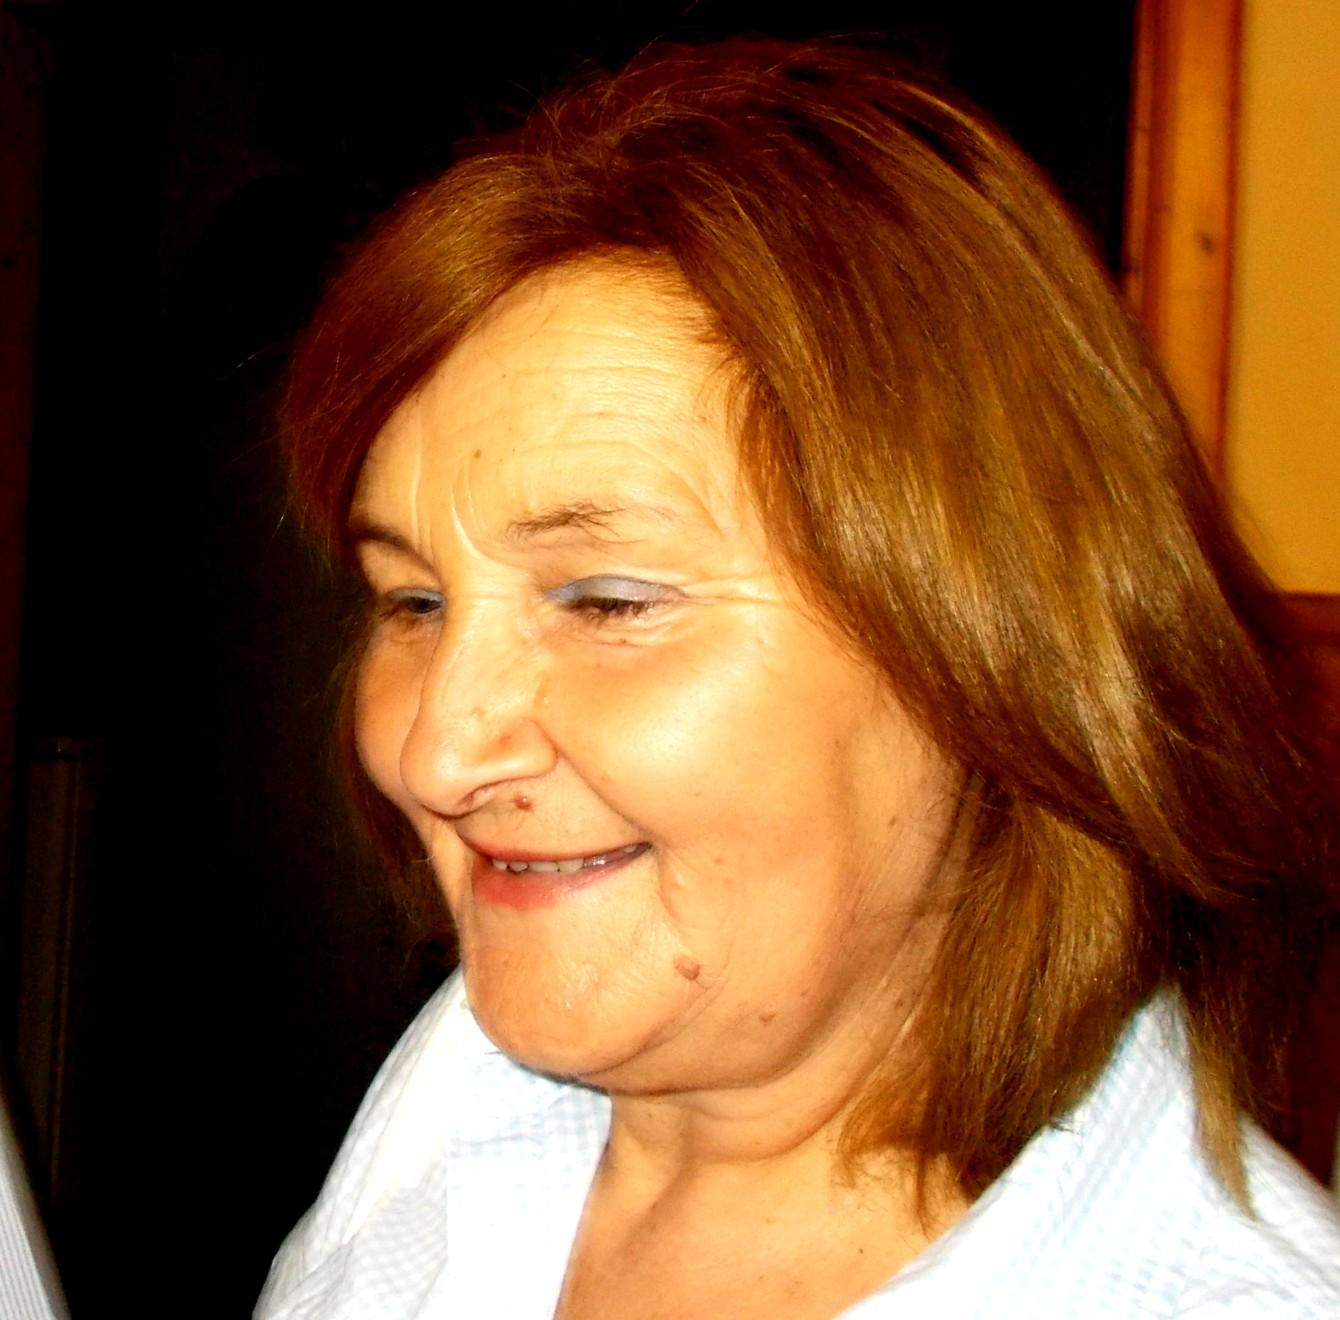 Maricica Davidiuc